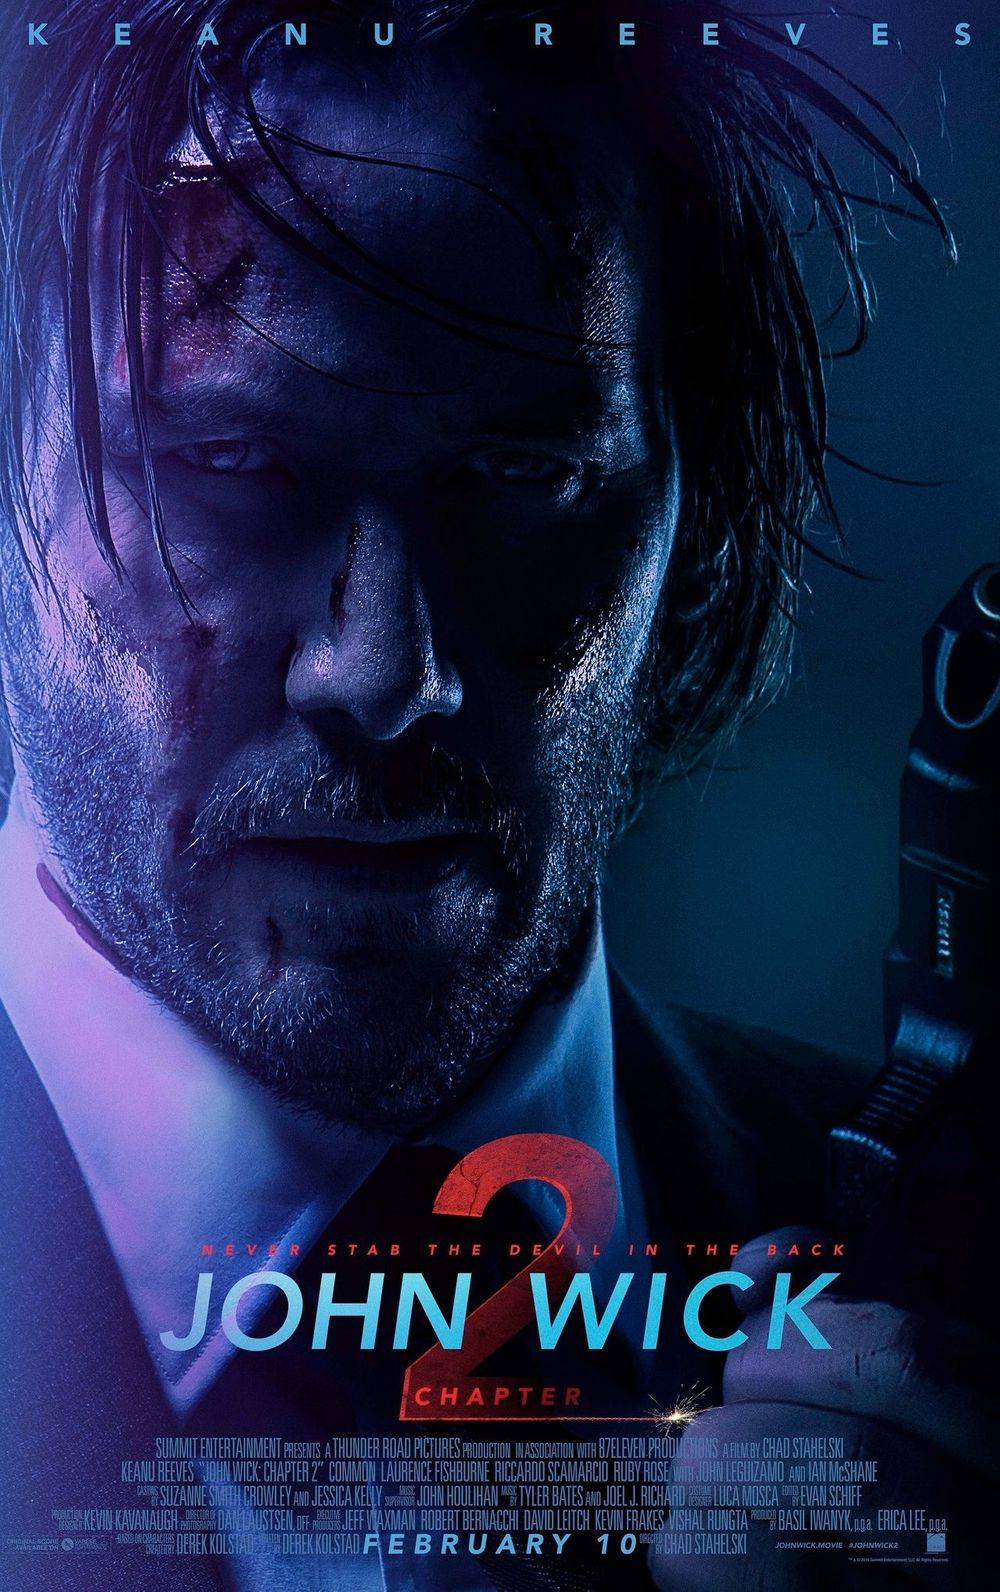 Movie poster for John Wick 2 starring Keanu Reeves